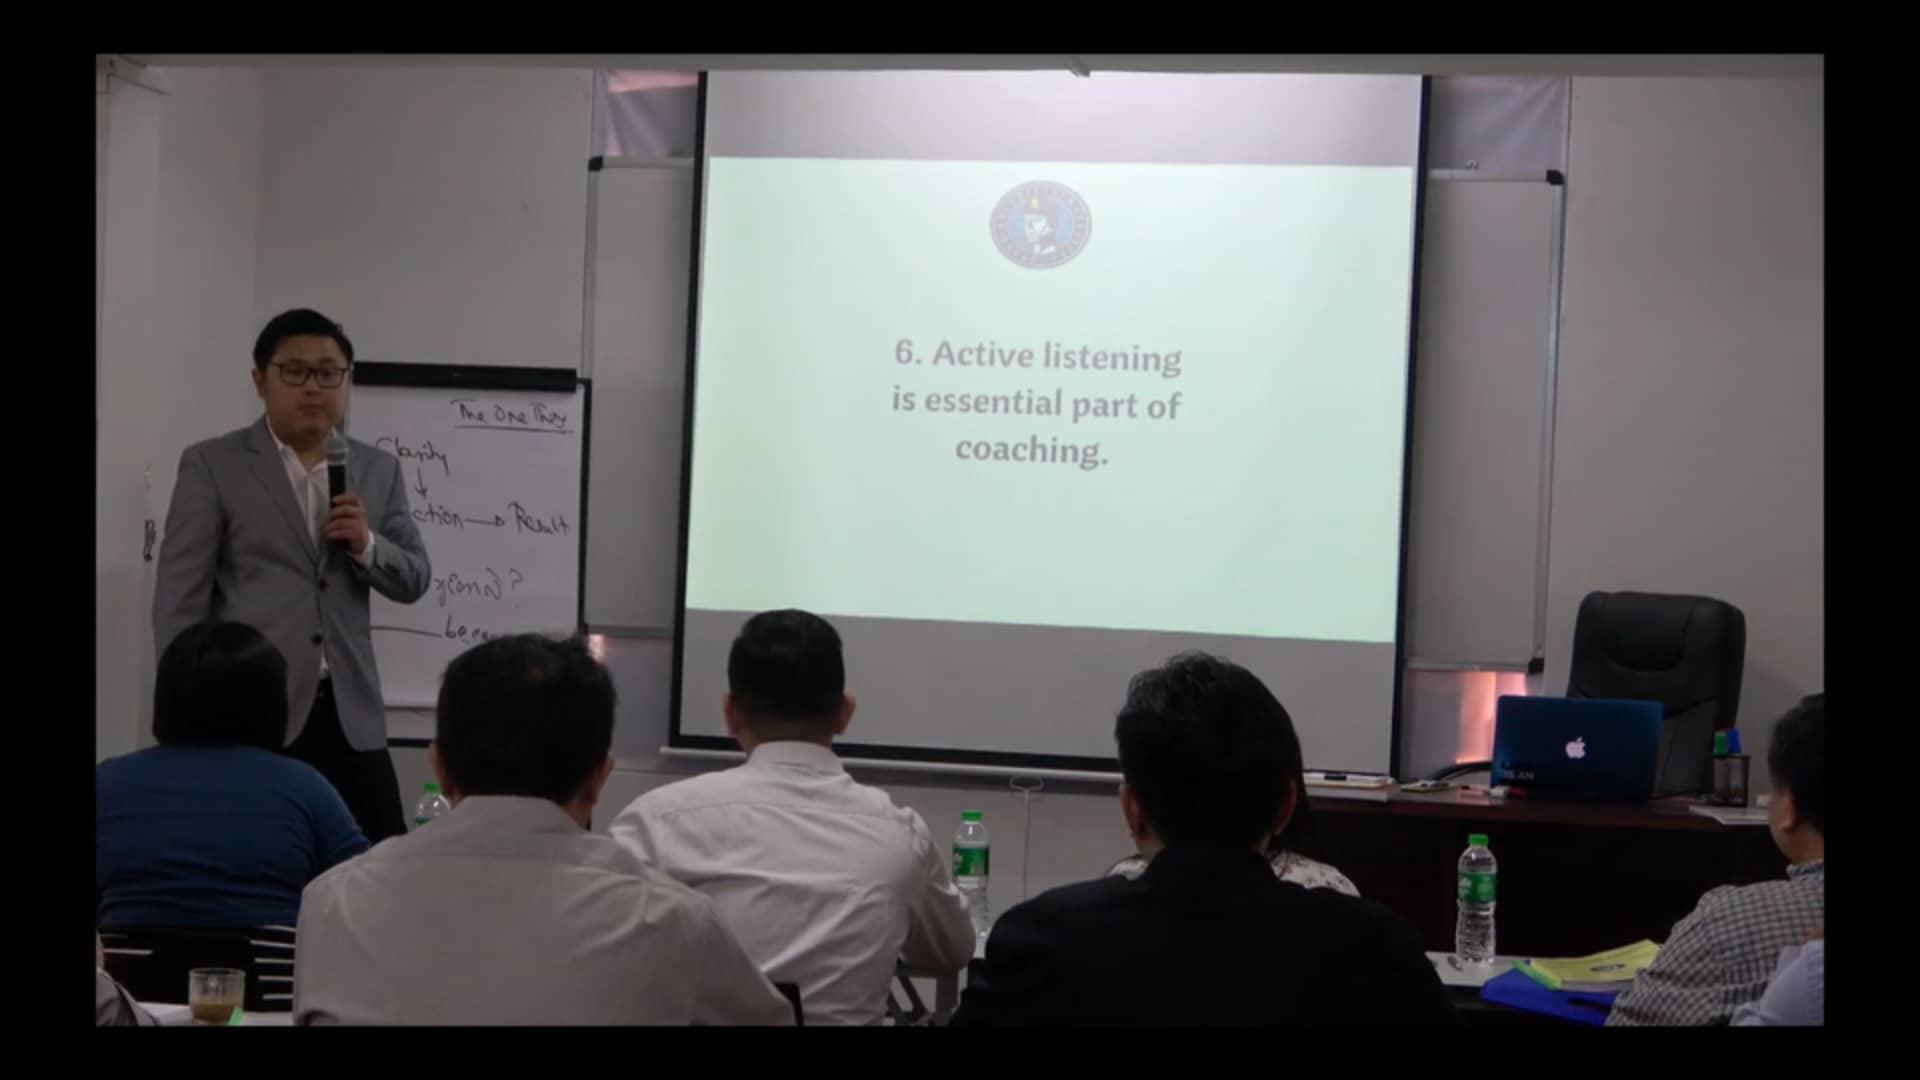 6 Active listening